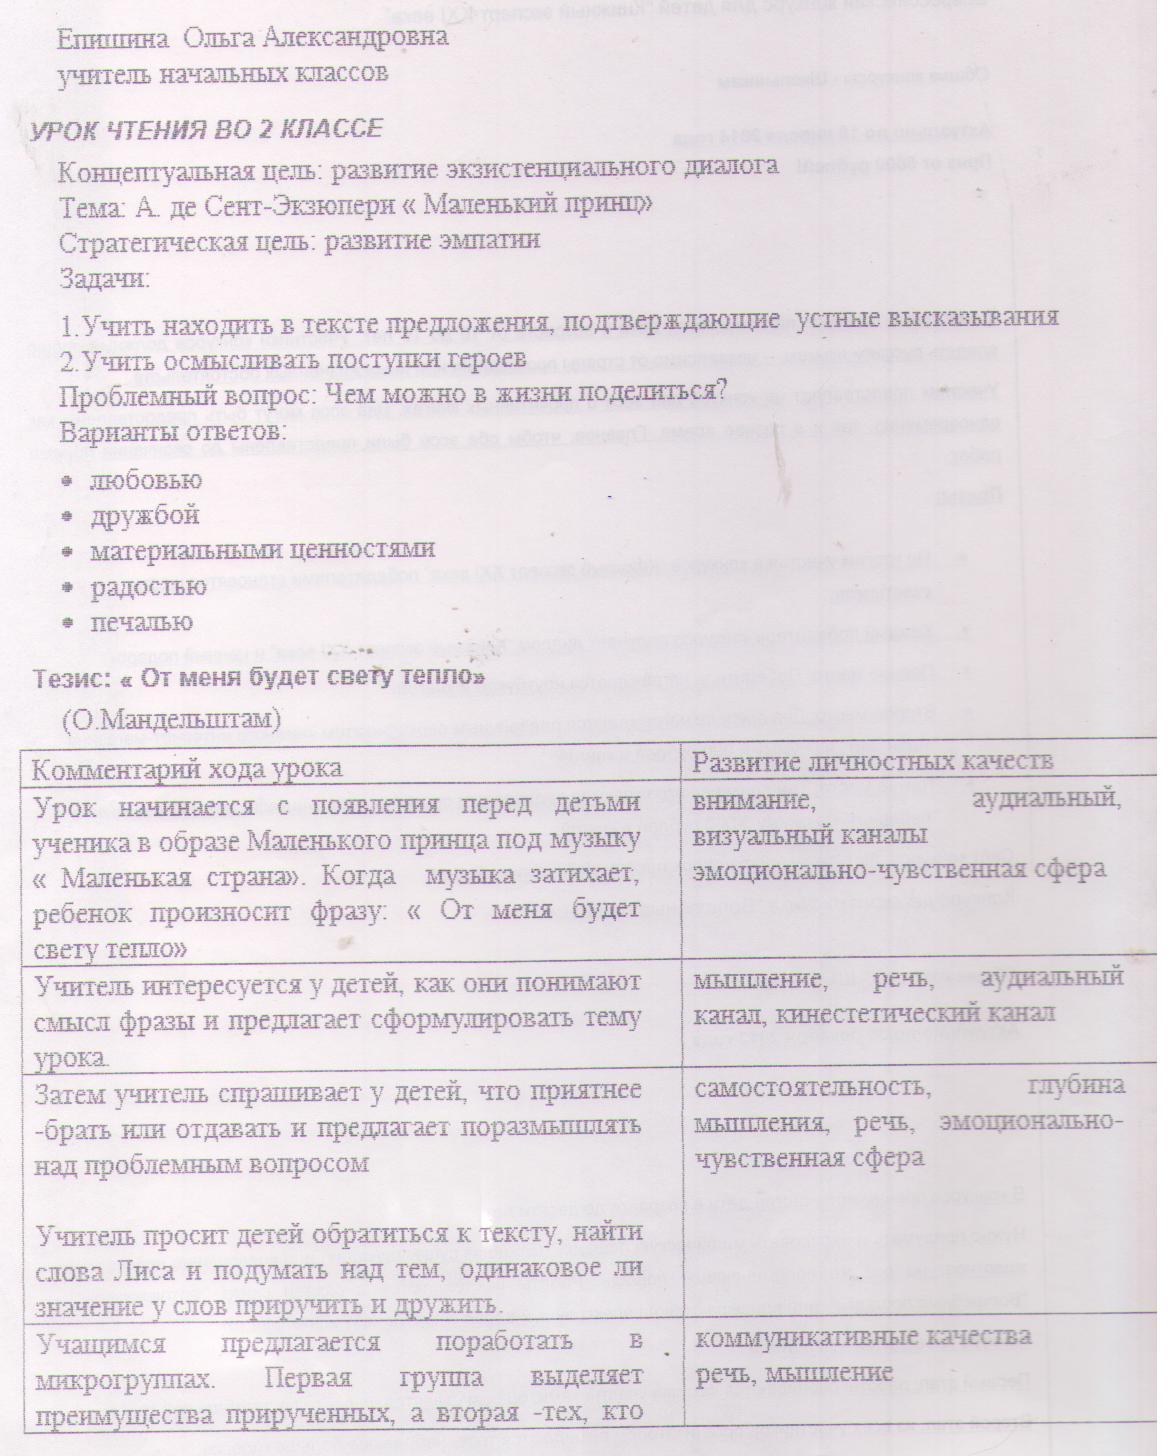 C:\Documents and Settings\ольга\Рабочий стол\1 страница.jpg